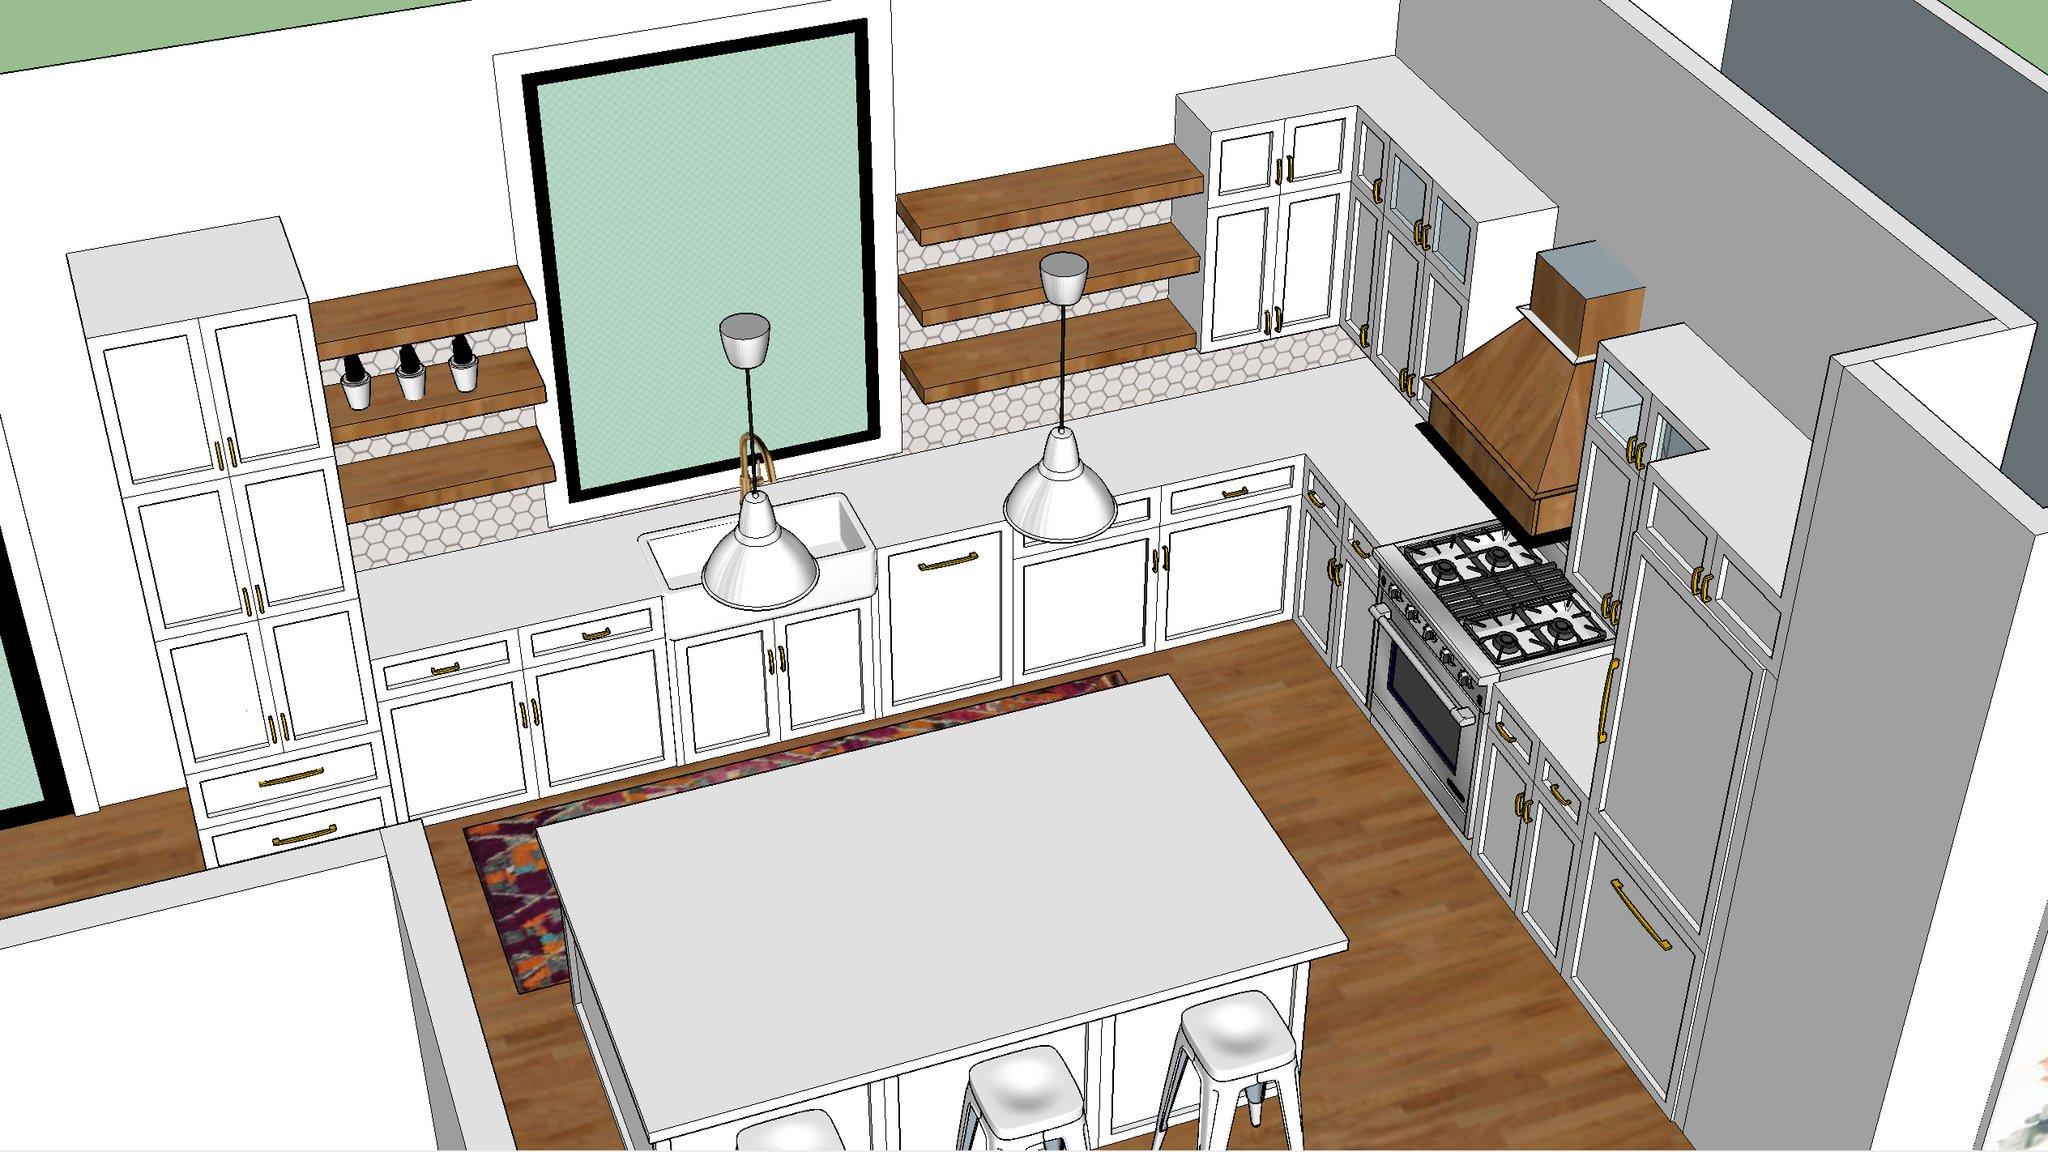 Love_Ding_Blog_Home_Renovation_Project_Austin_Texas_Kitchen_Interior_Design_Mock_Up.jpg